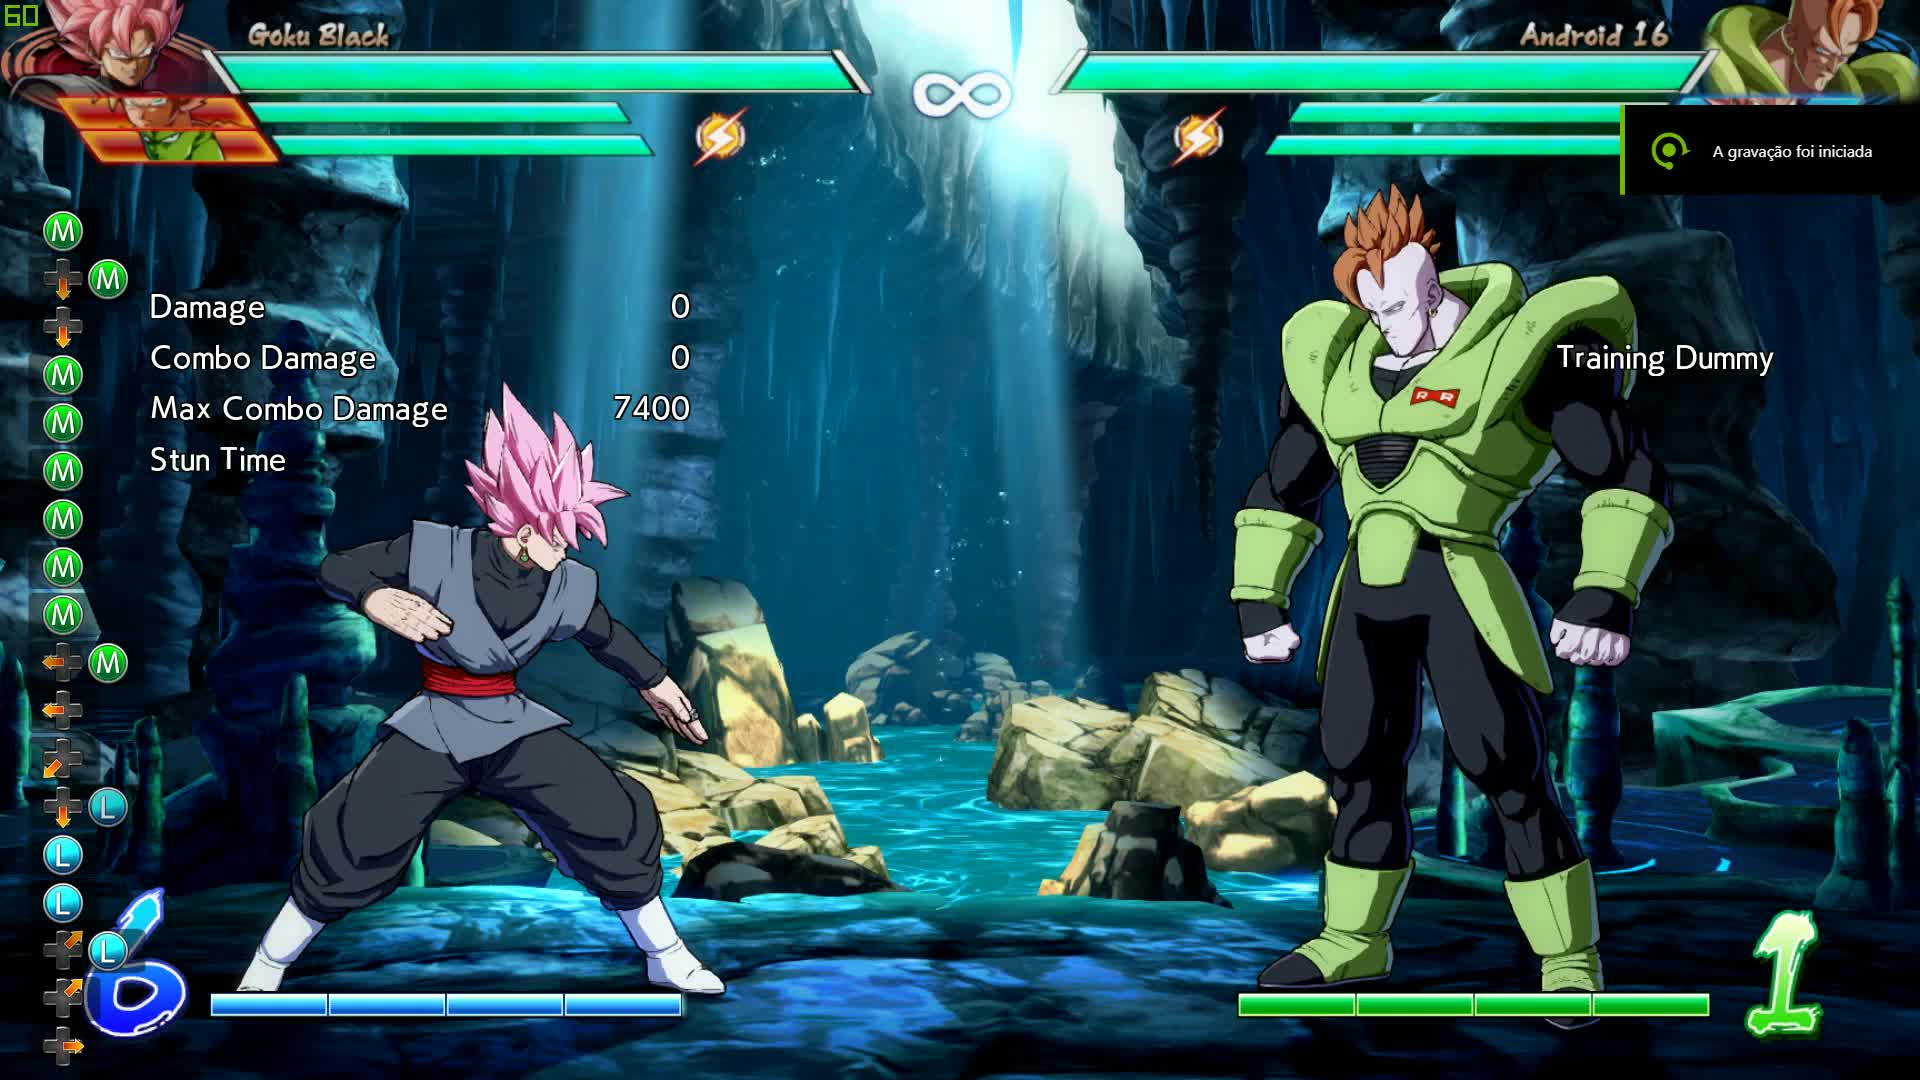 Dragon Ball FighterZ, dbfz, Well then GIFs